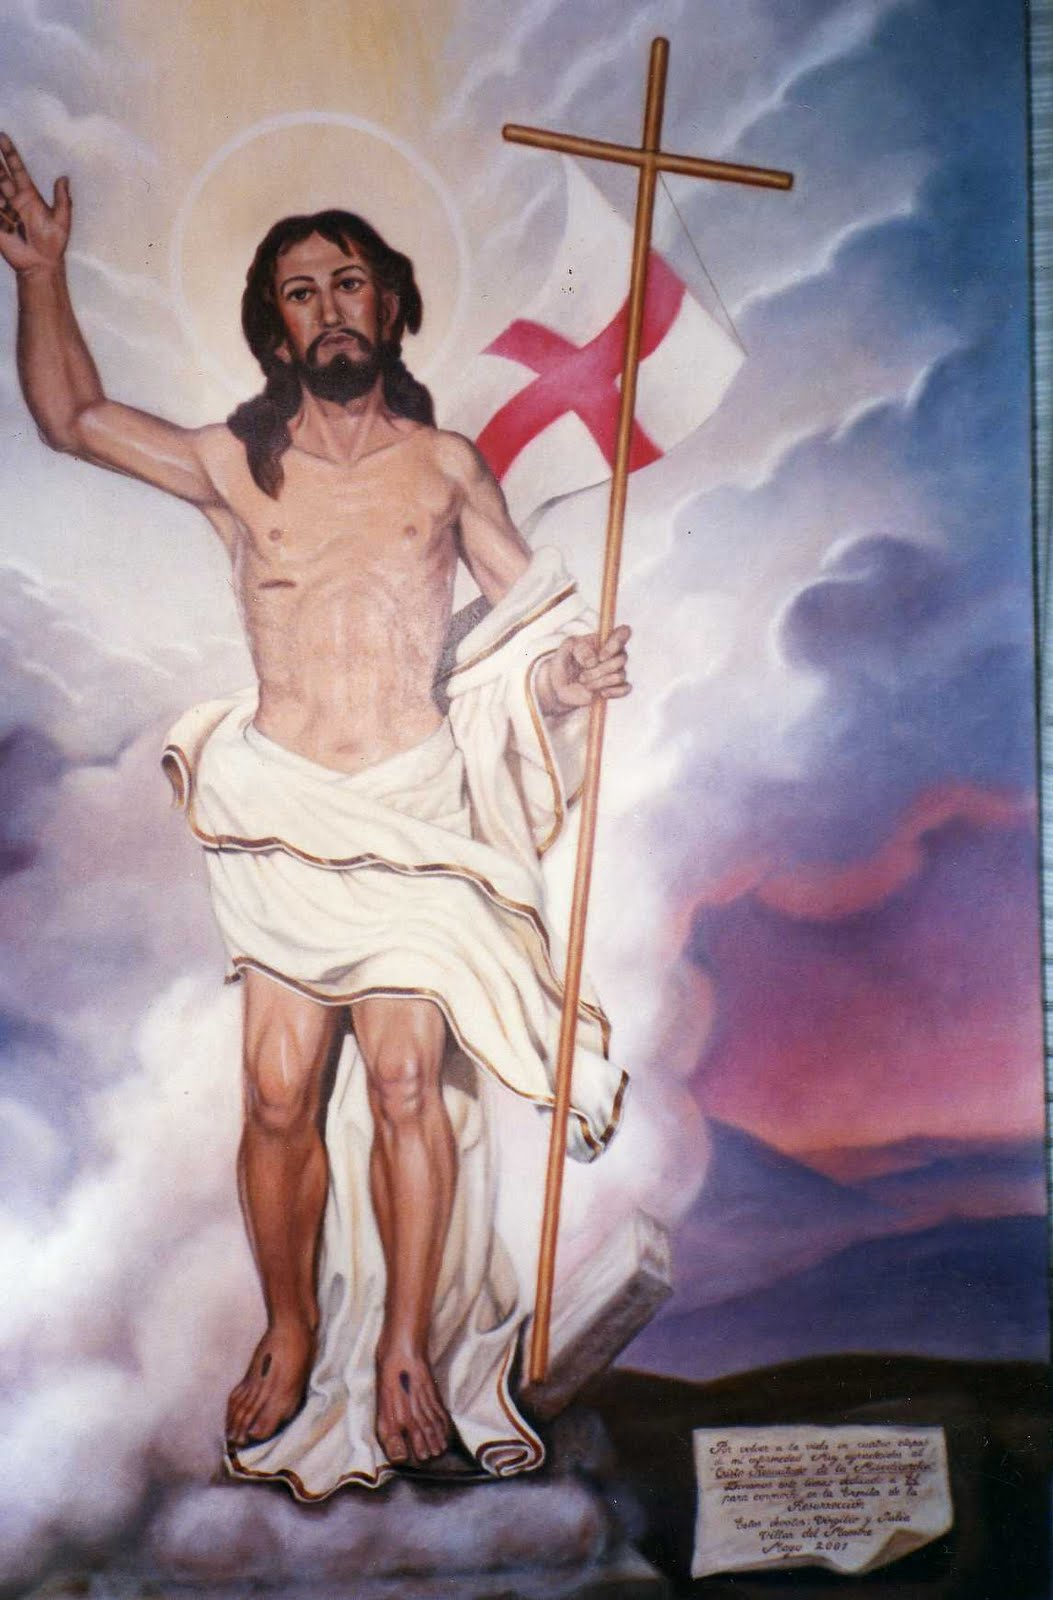 Imagenes de Jesus - Fotos Jesus de Nazaret - Corazón